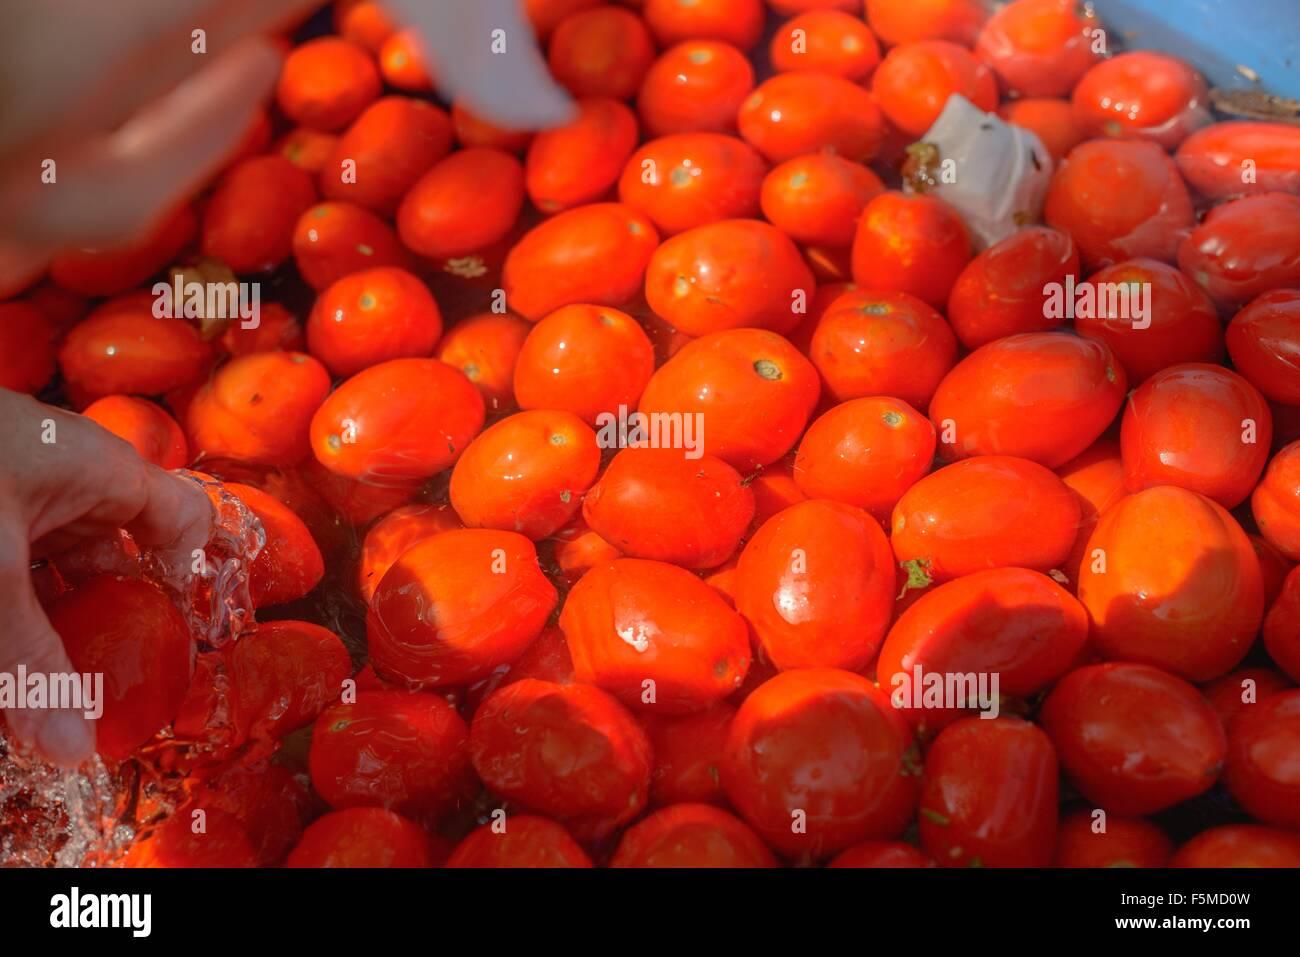 La recogida de la mano de agua de tomate Imagen De Stock